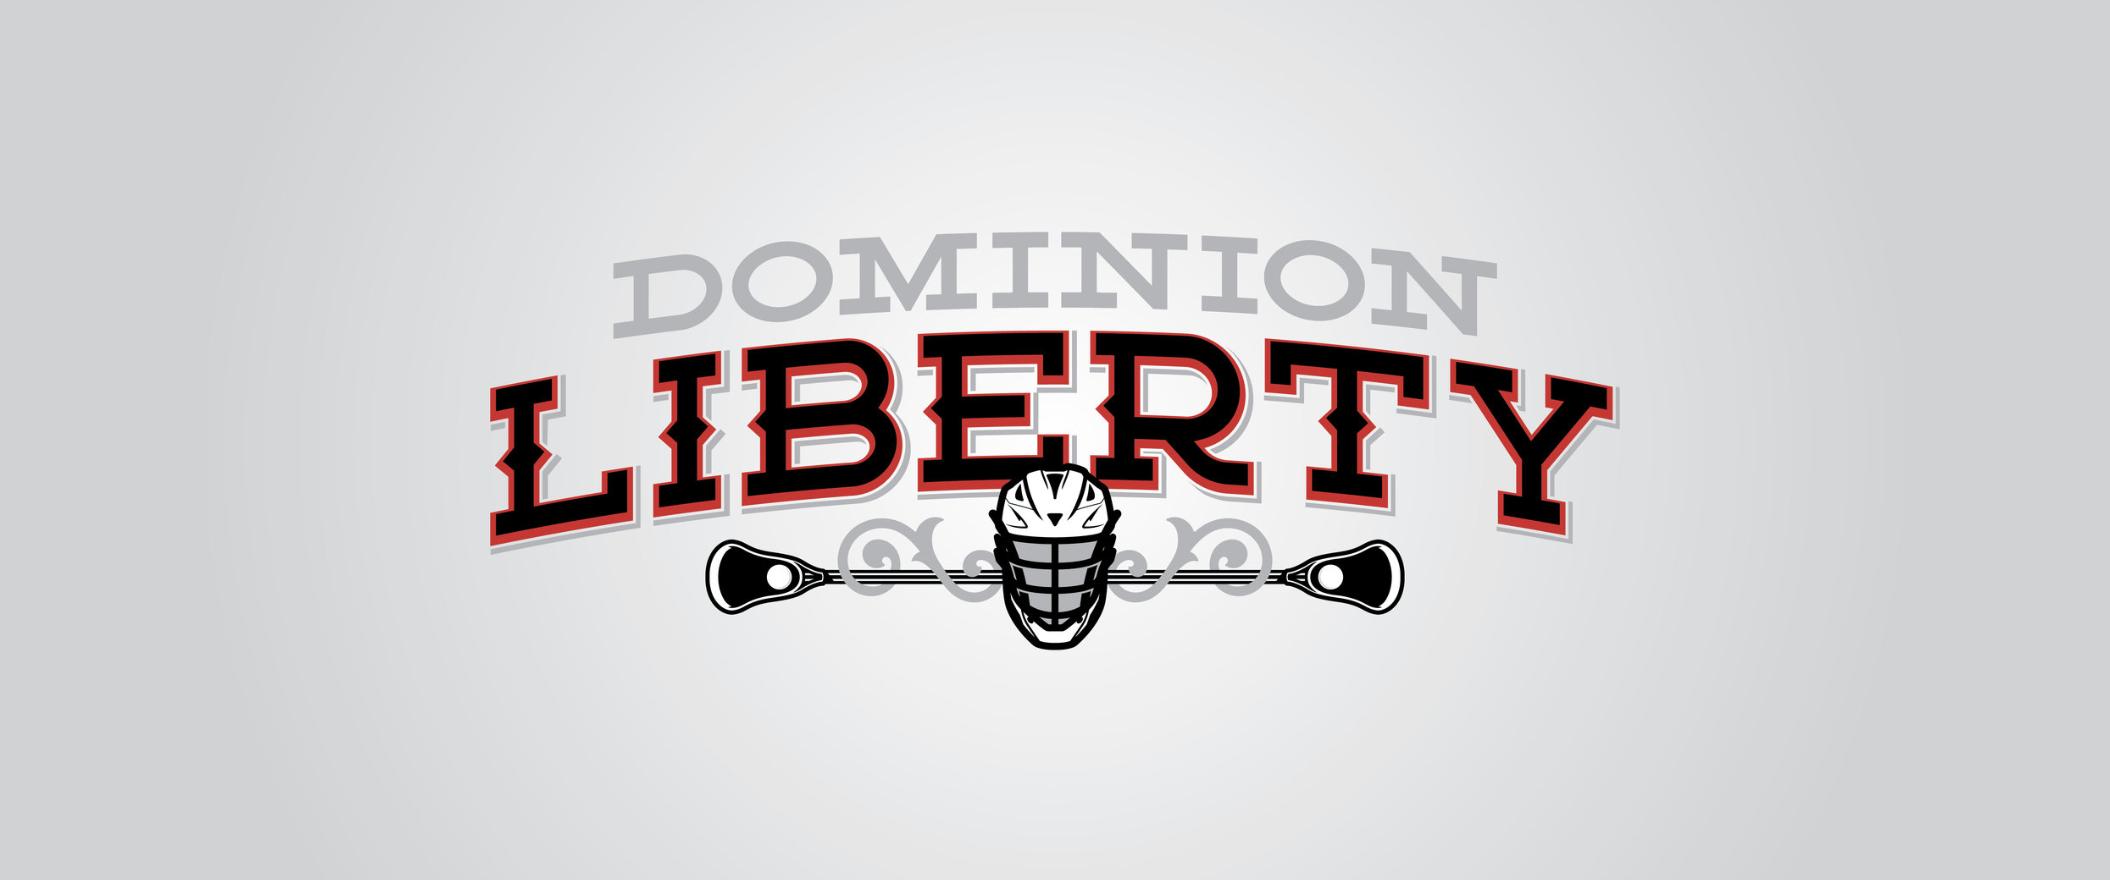 liberty_boys_header.png